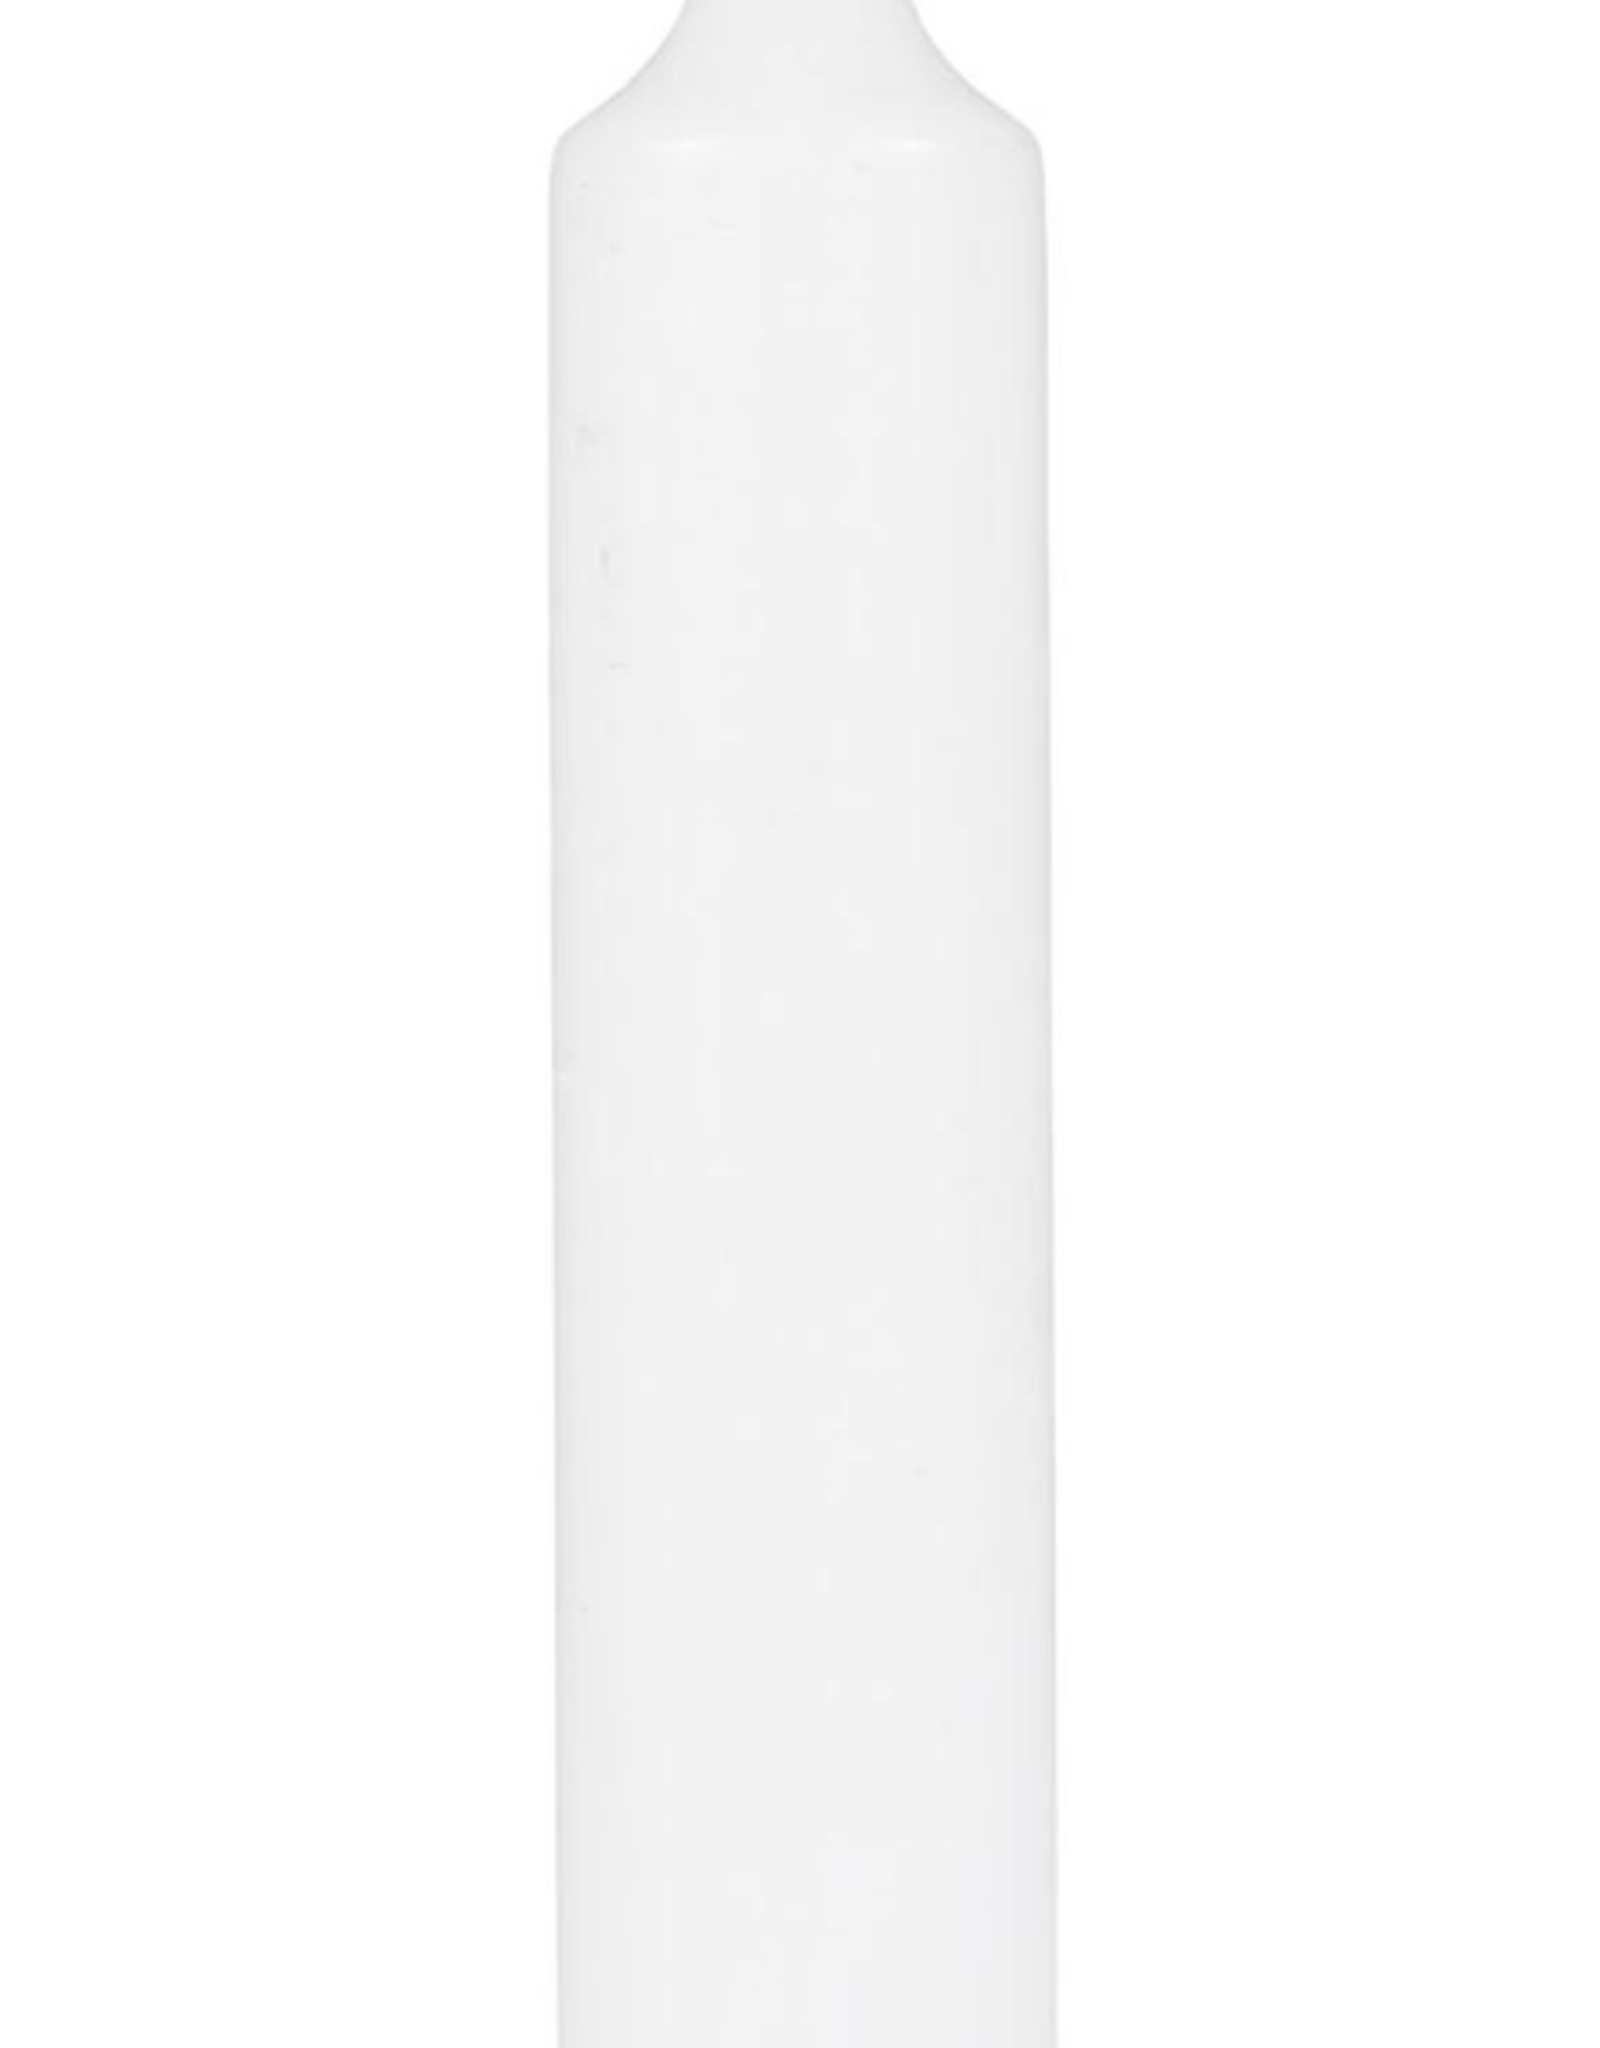 Dregeno Dregeno Advent Candles 20.5mm White